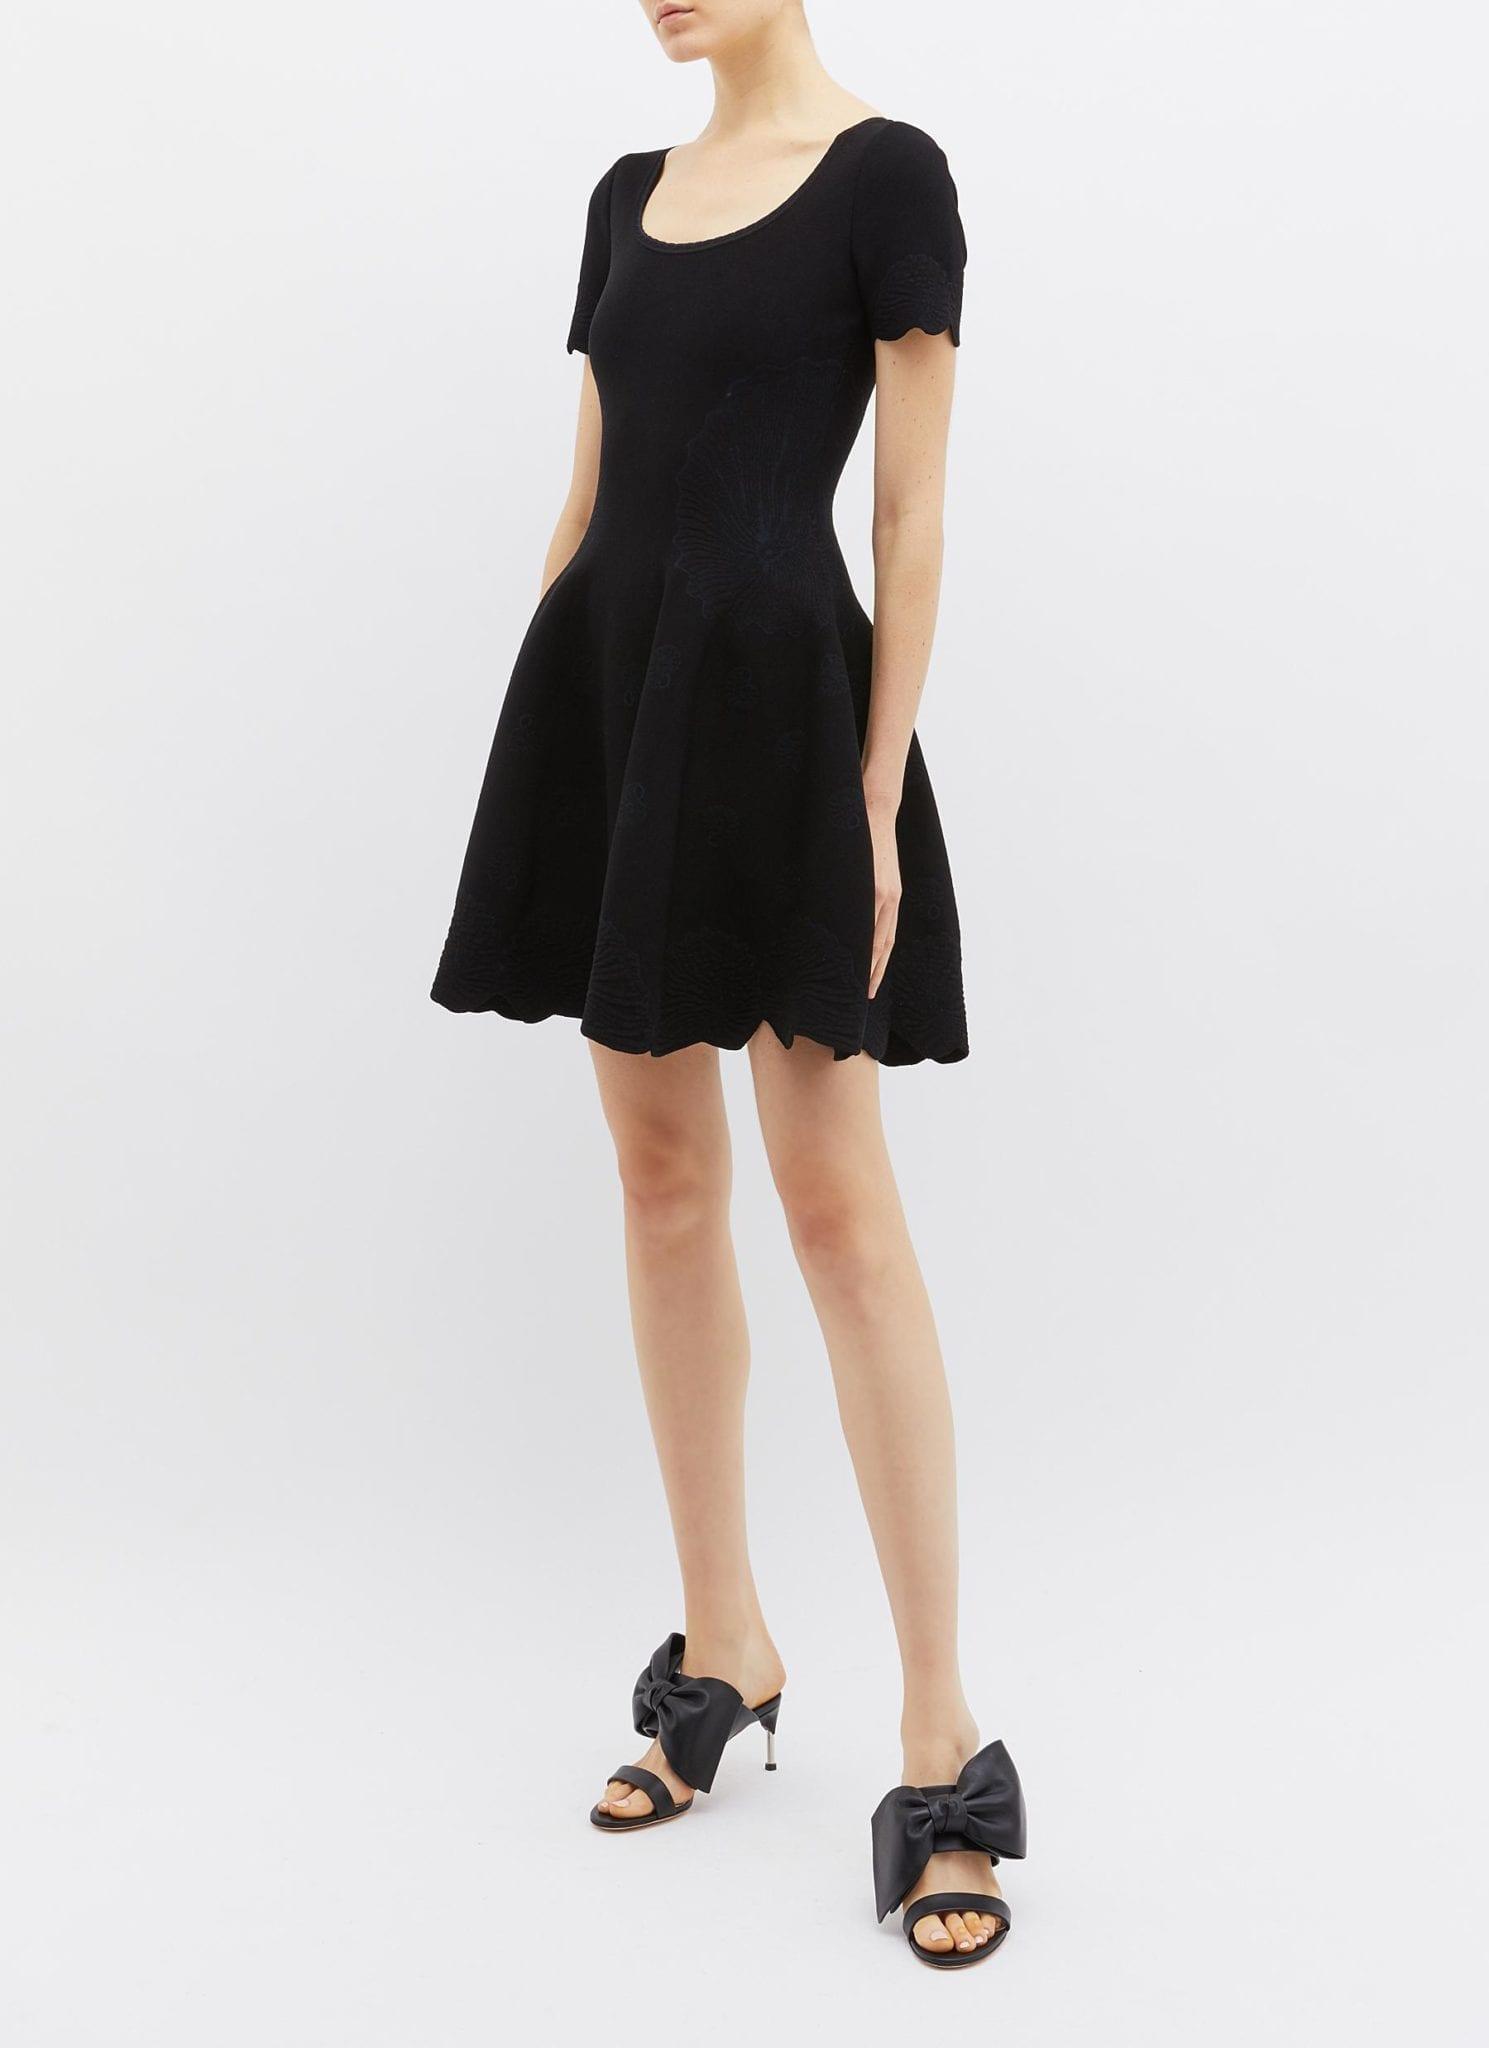 ALEXANDER MCQUEEN Scalloped Shell Jacquard Knit Black Dress